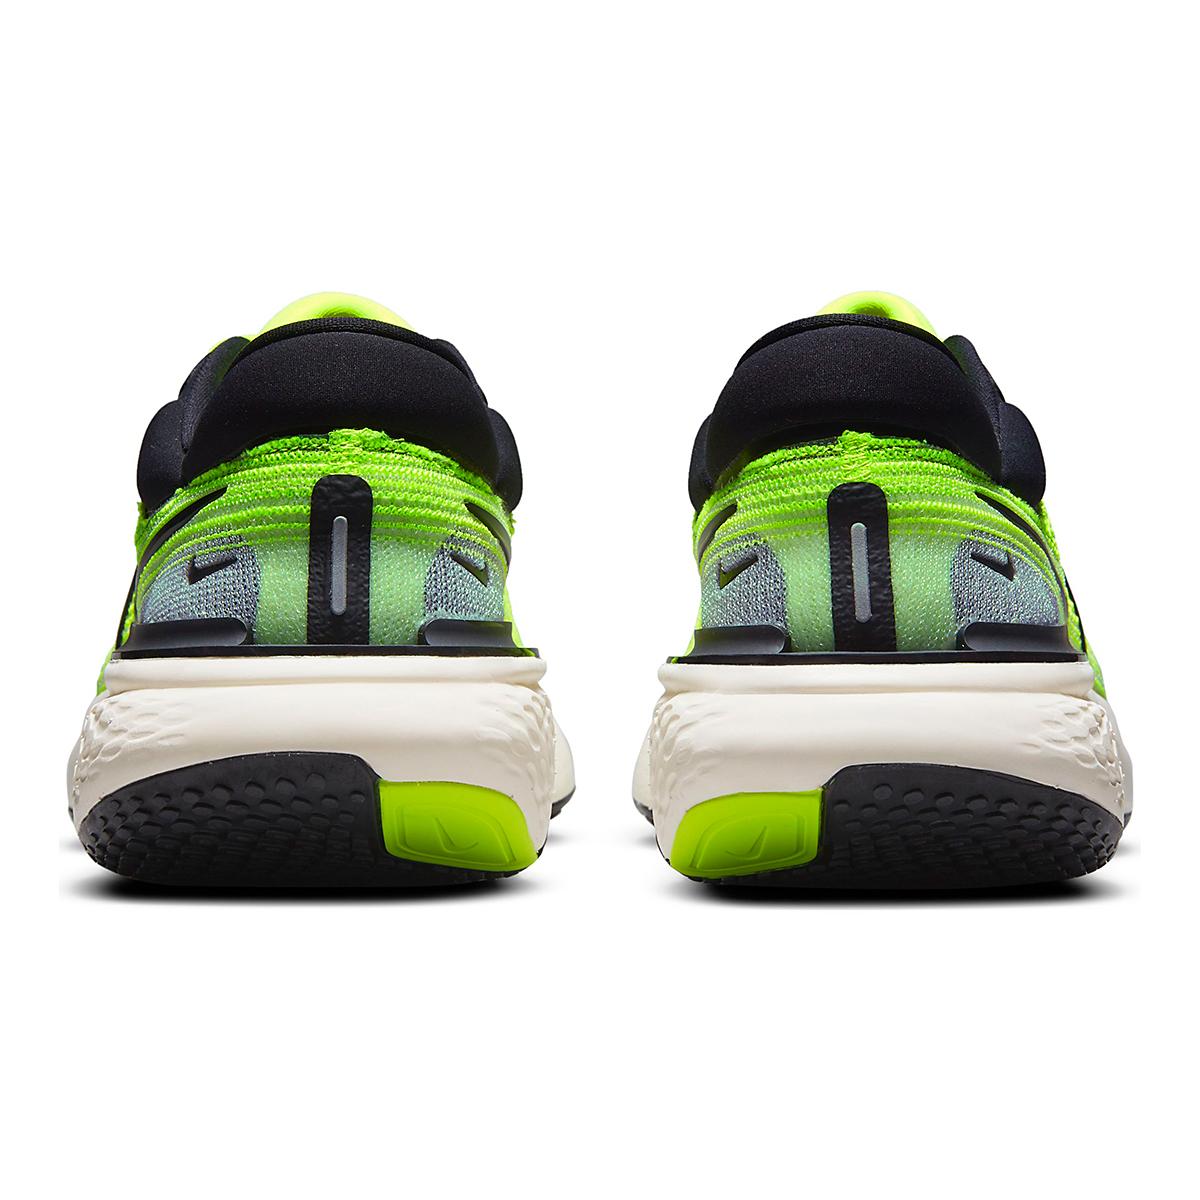 Men's Nike Zoomx Invincible Run FlyKnit Running Shoe - Color: Volt/Black/Barely Volt - Size: 6 - Width: Regular, Volt/Black/Barely Volt, large, image 5